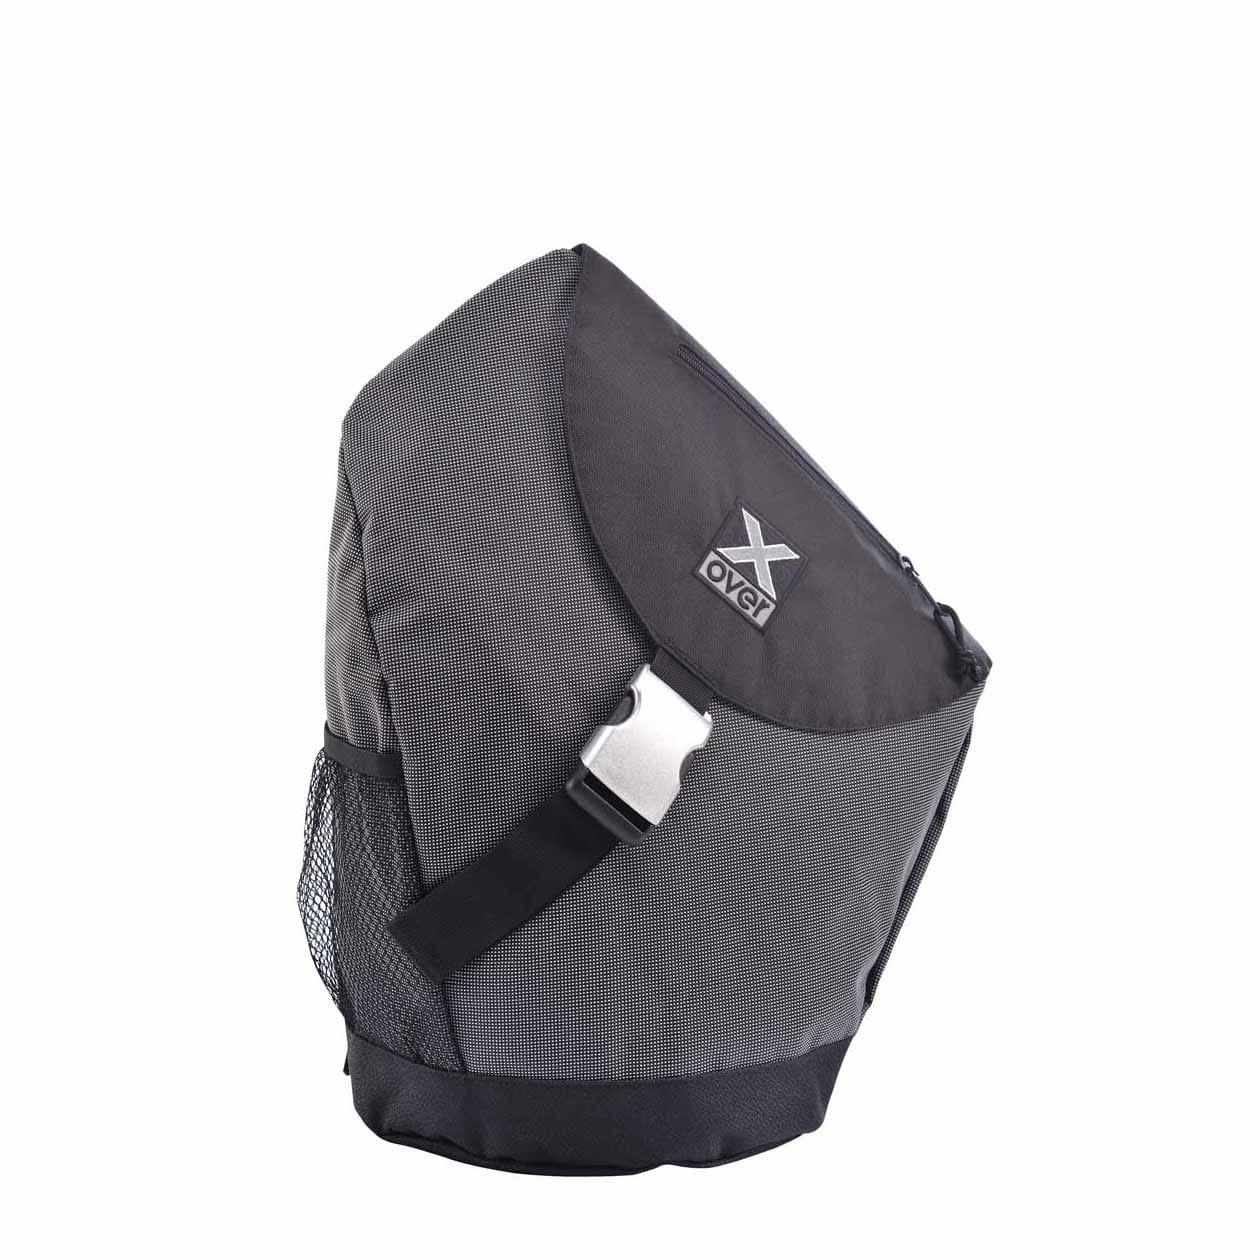 x-over schuine rugzak original steel pointed black medium